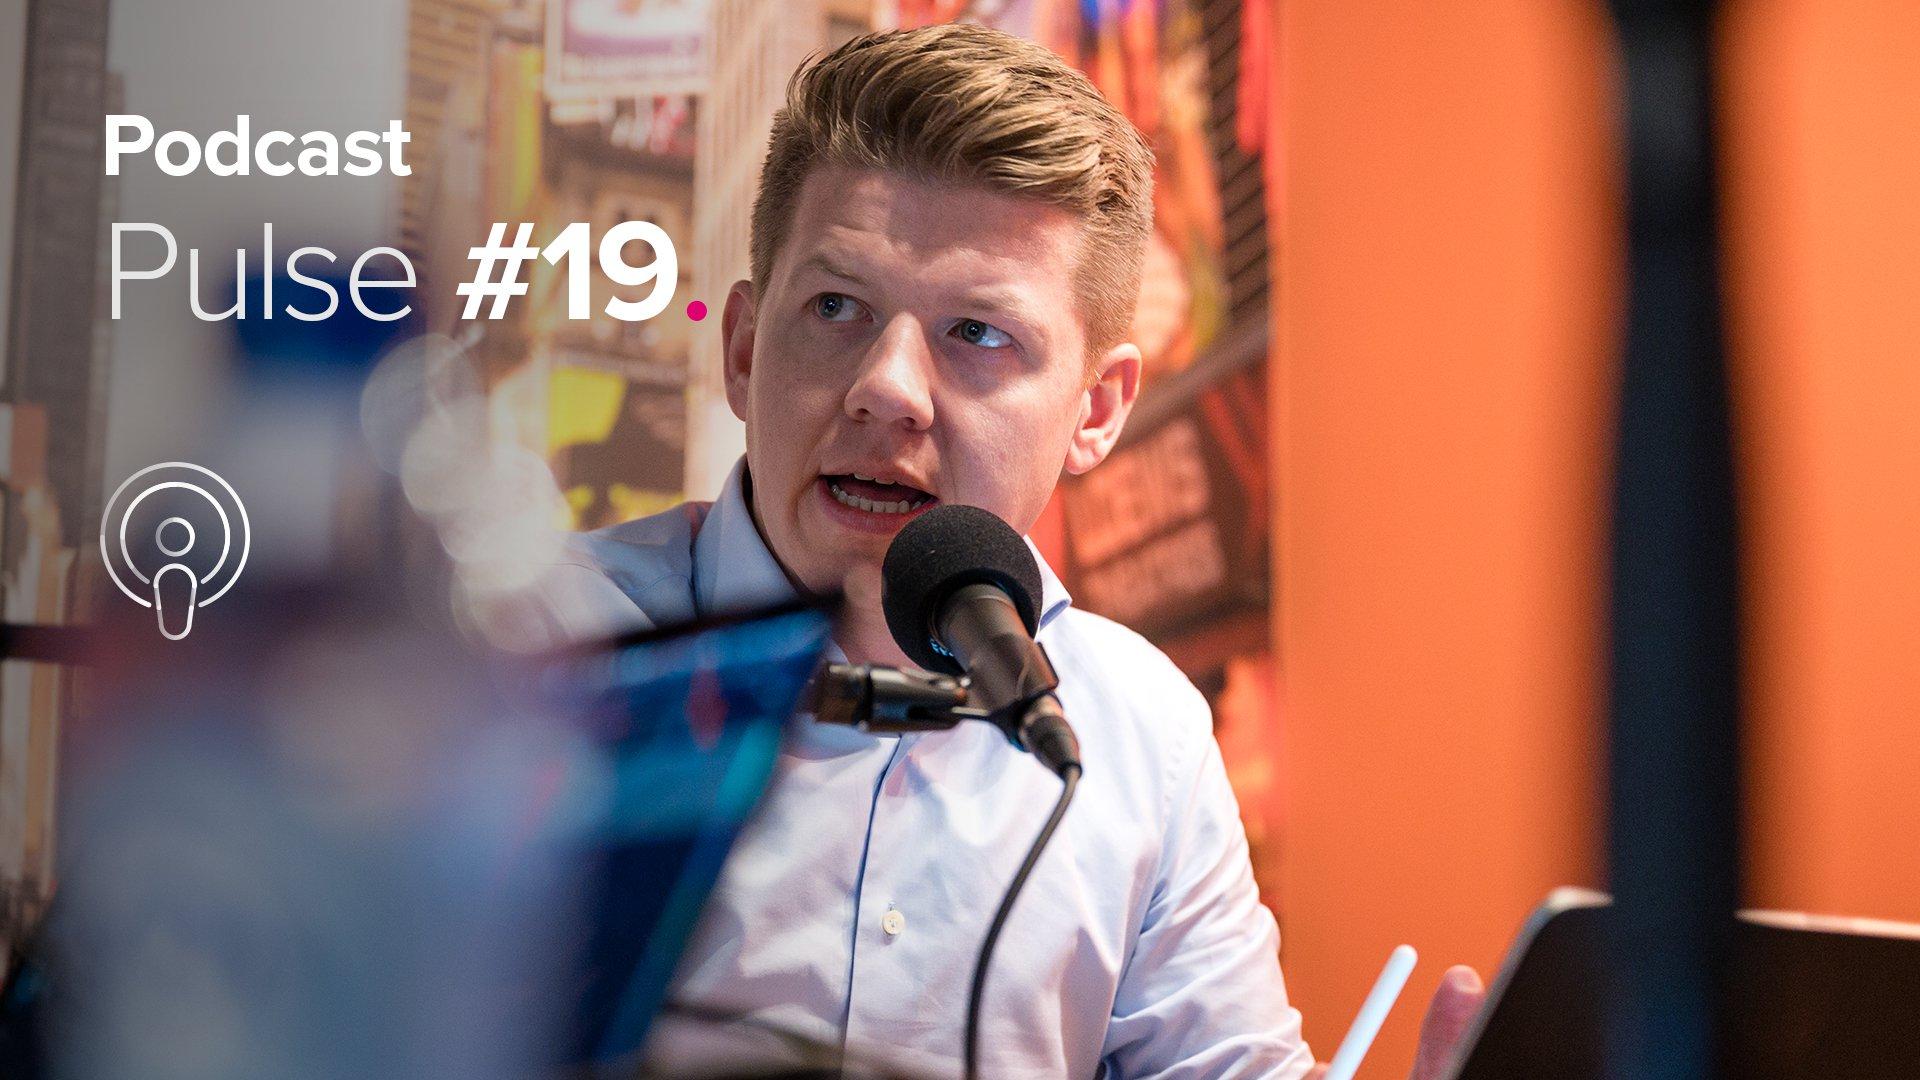 Podcast Digital Brains Pulse #19